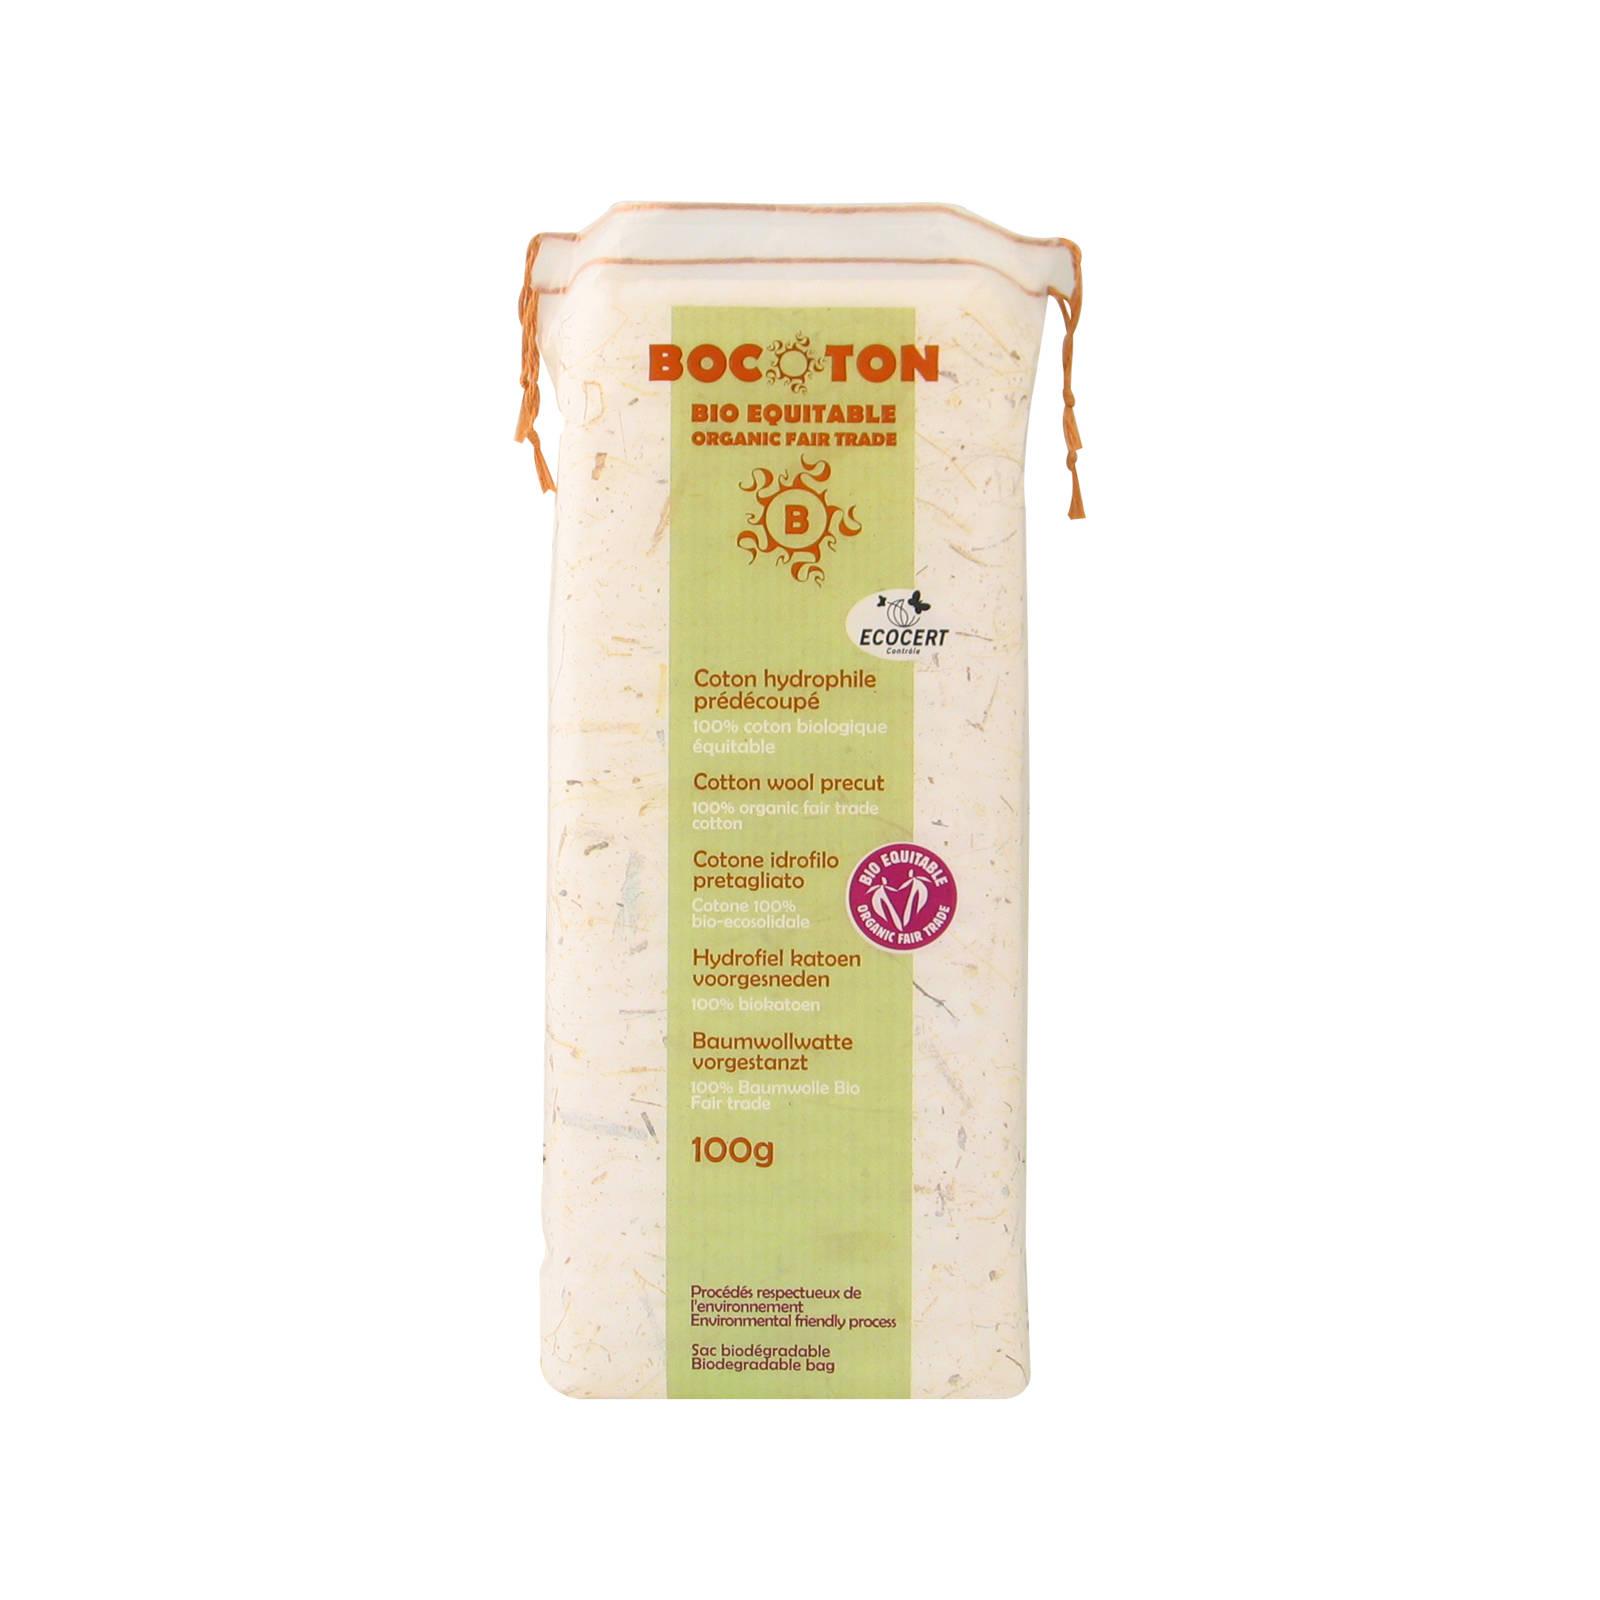 Bocoton Biovata skládaná, cotton wool precut 100 g